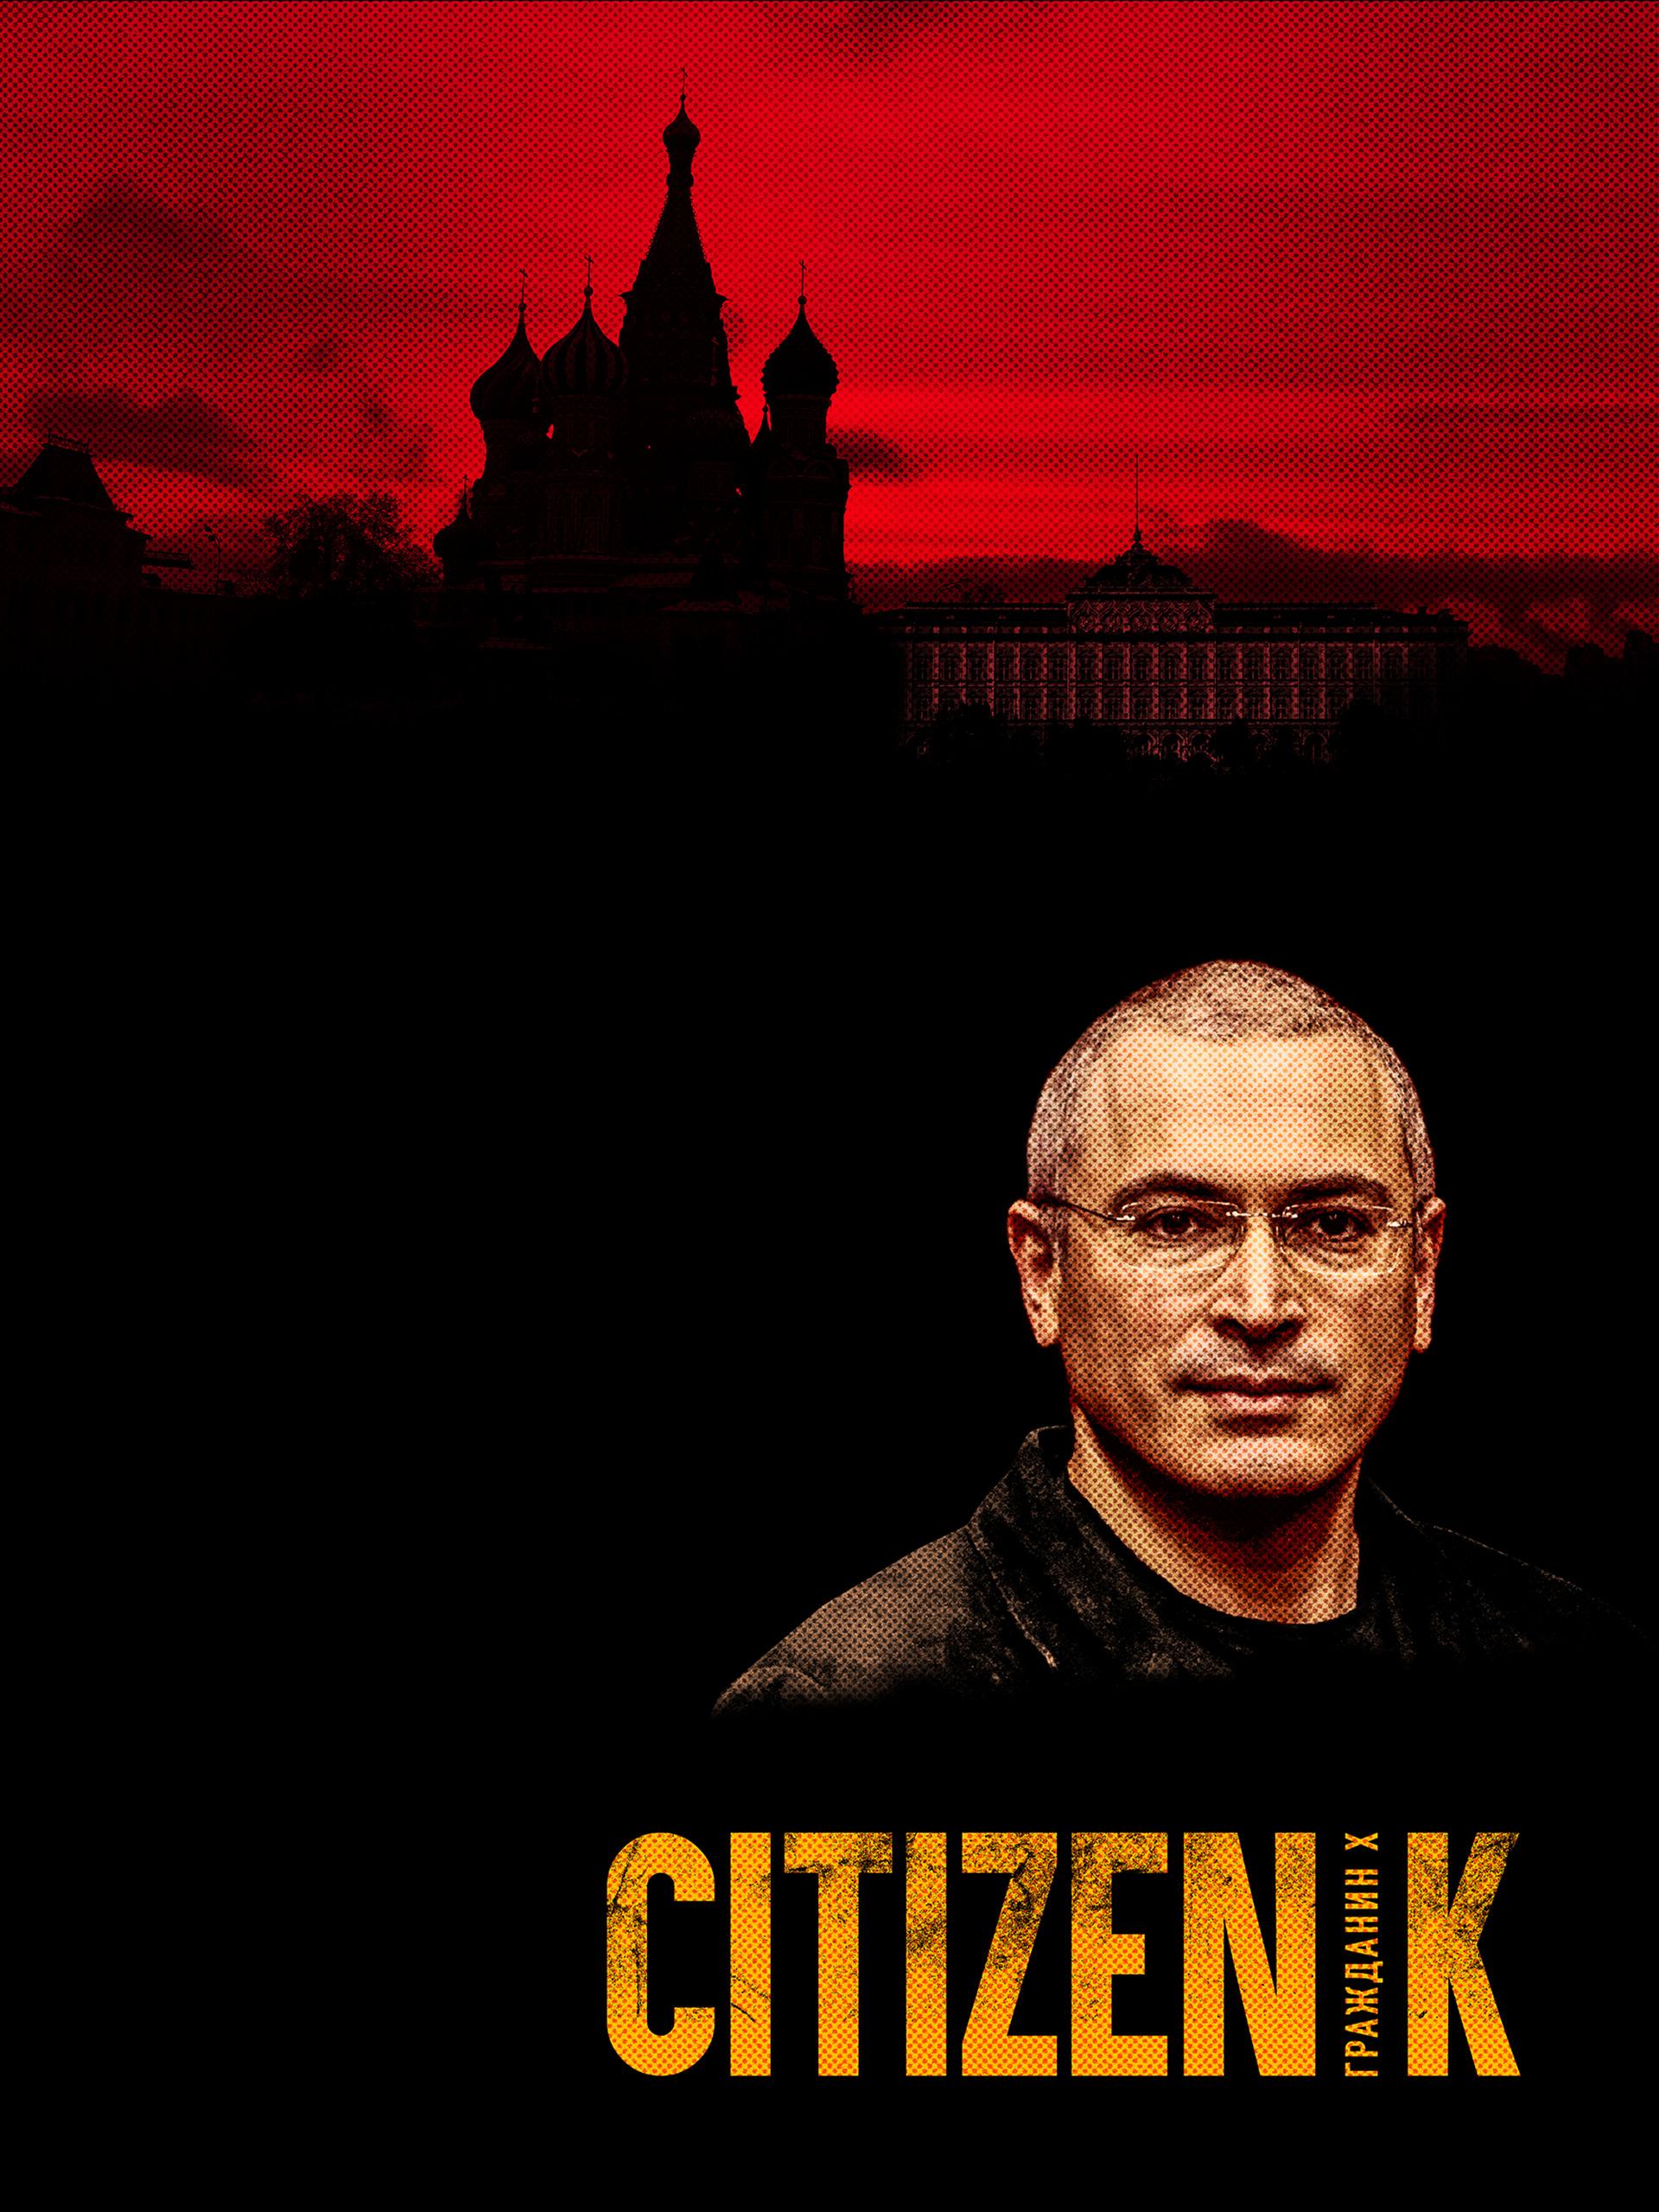 Citizen K